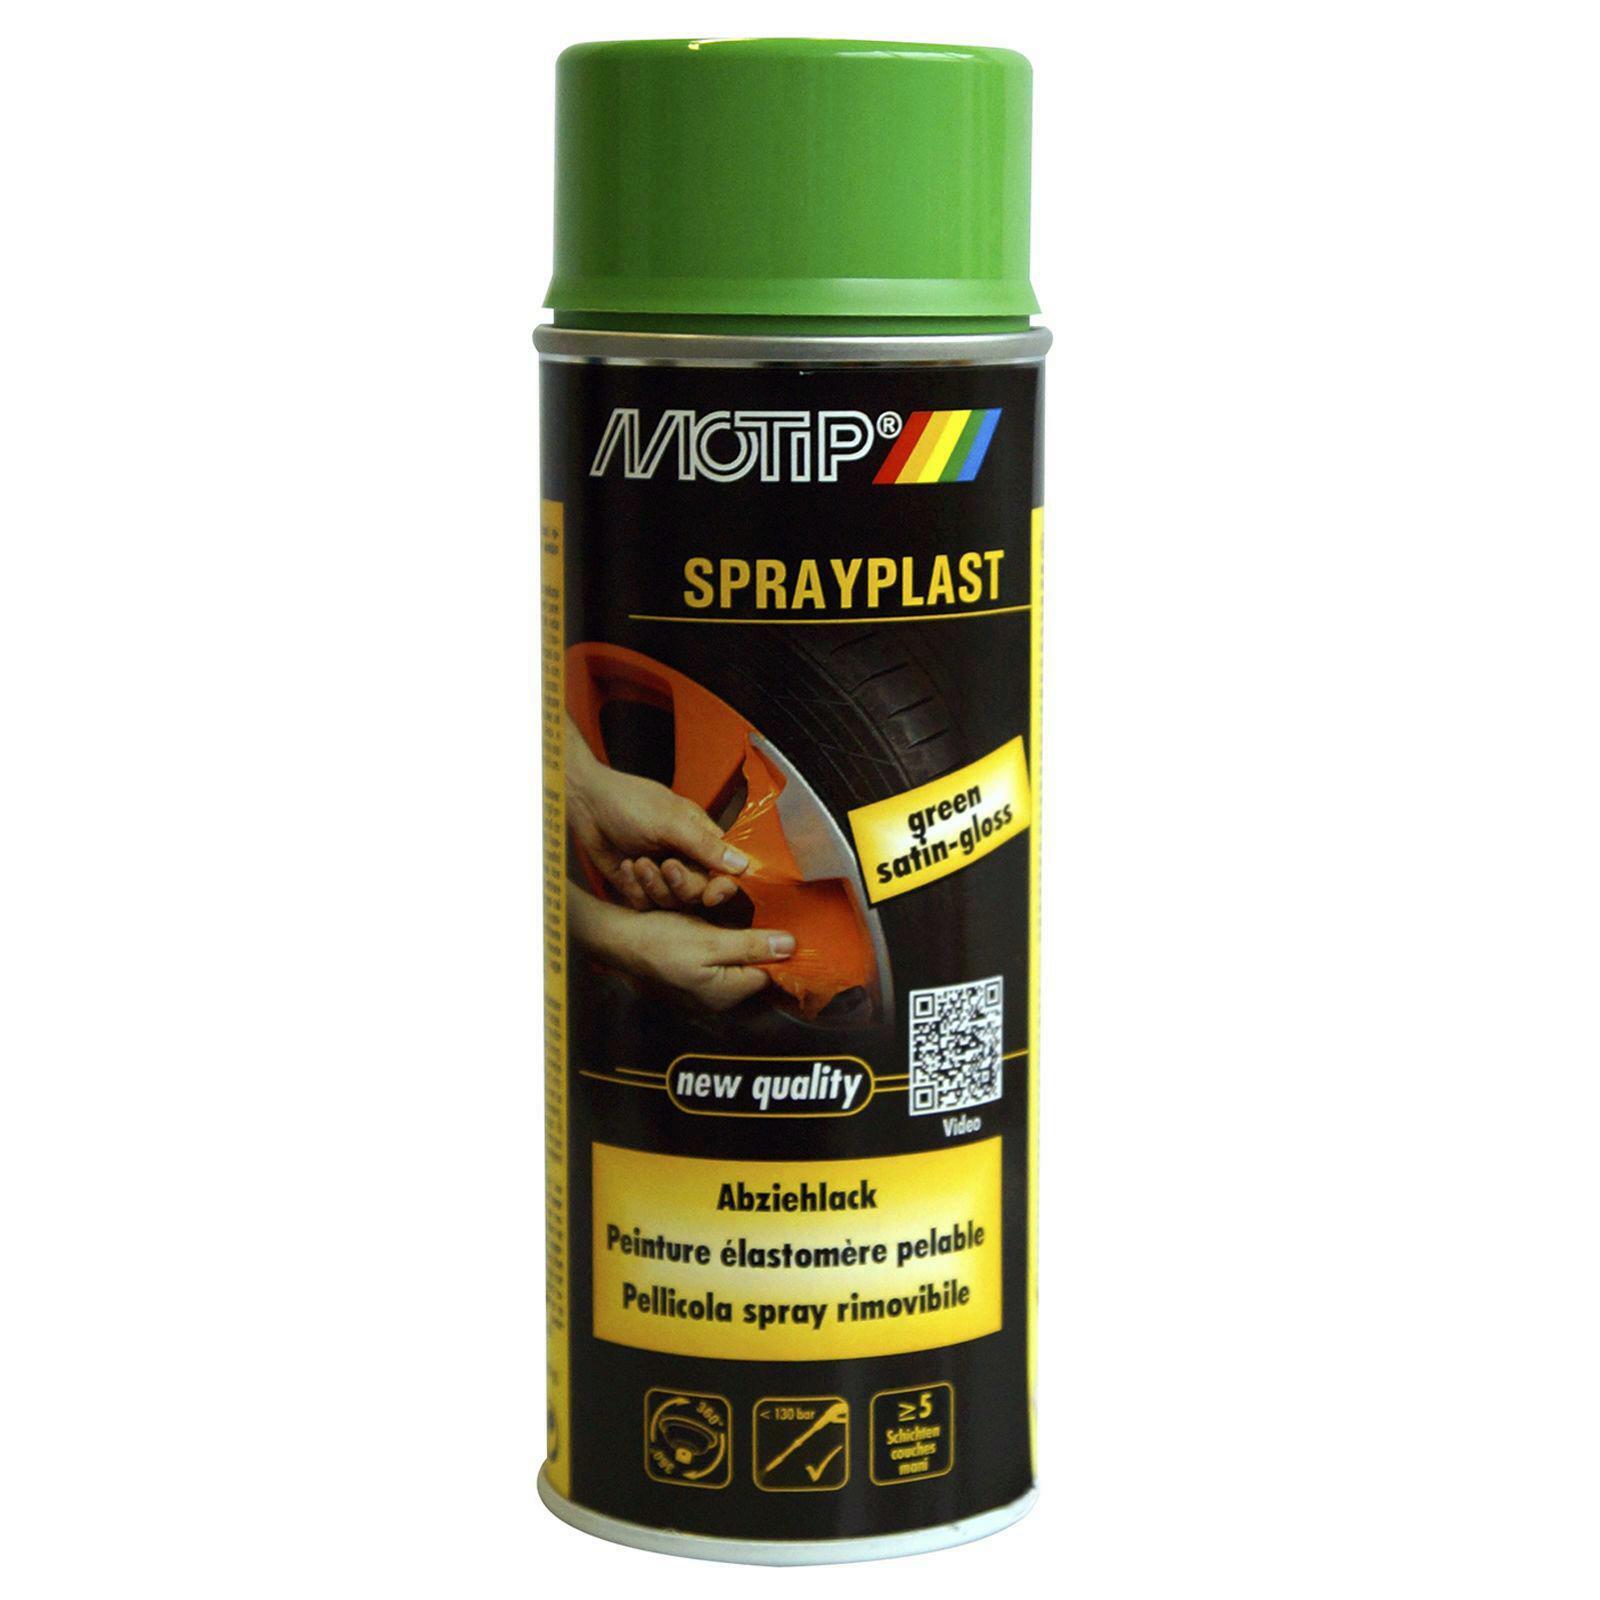 MOTIP Sprayplast Spray Abziehlack Lack grün 400ml